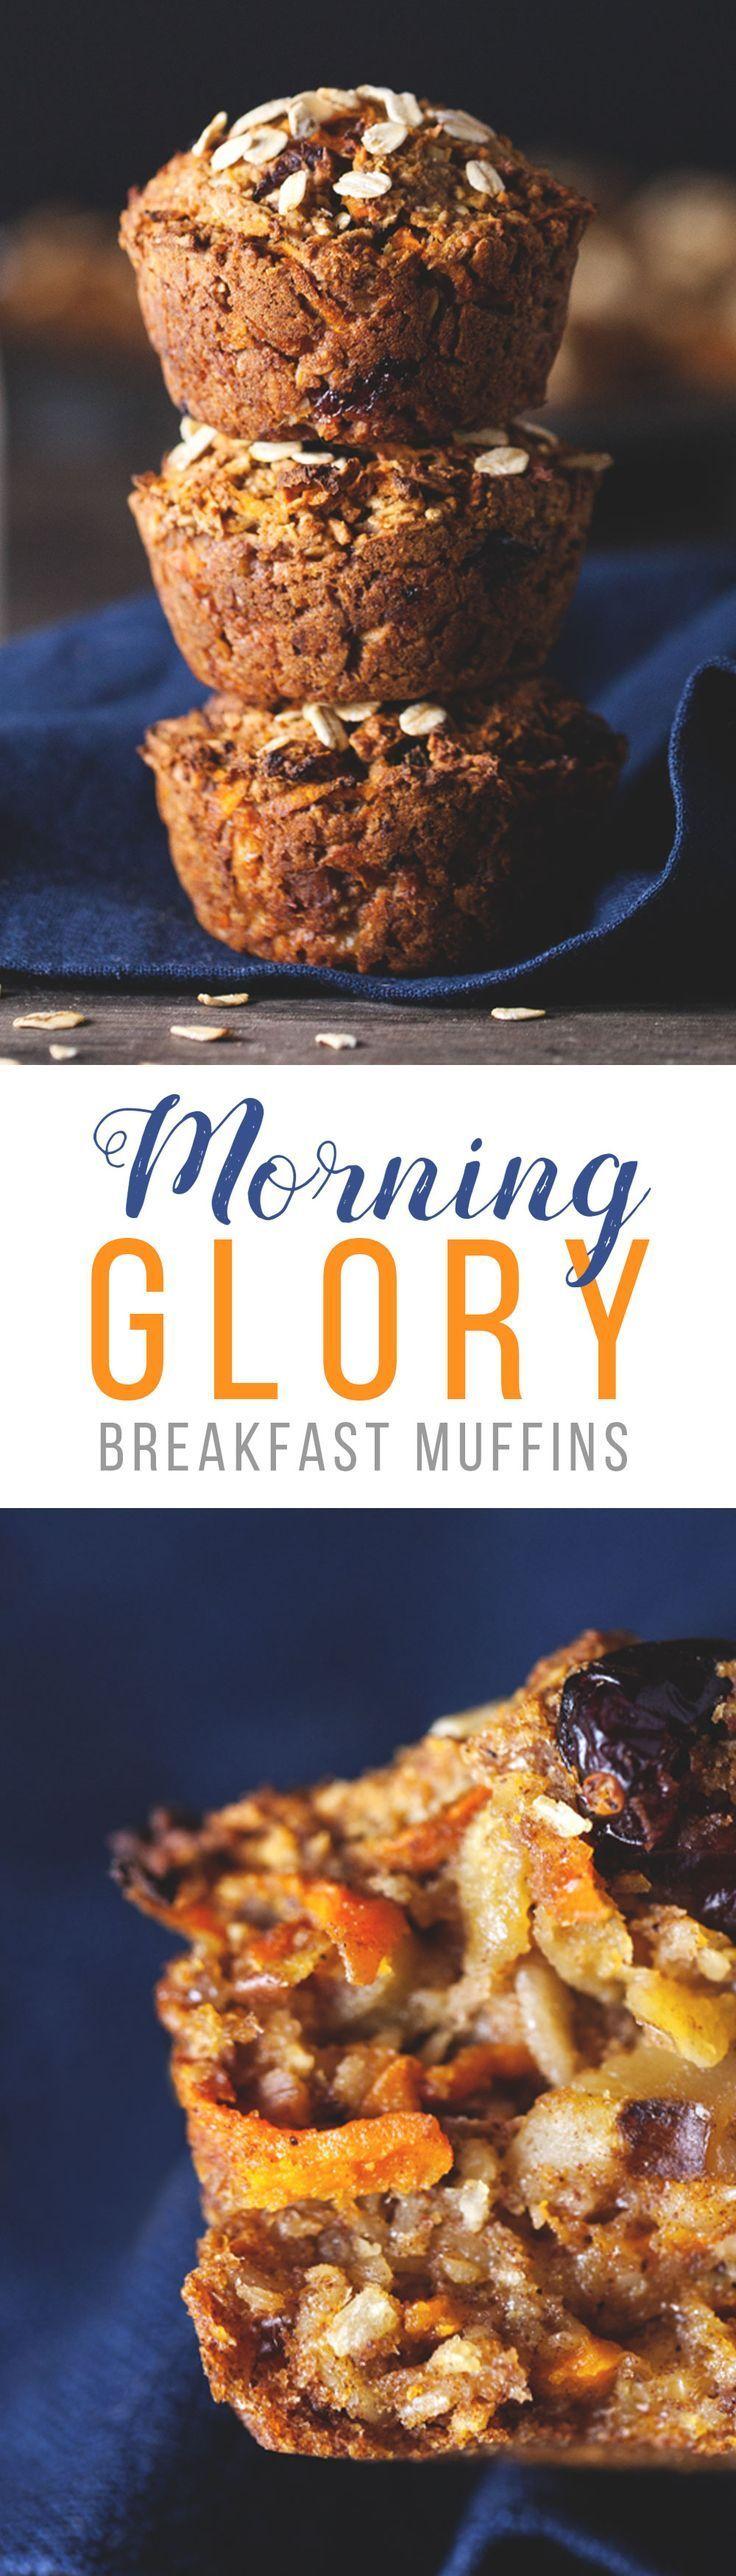 Nov 14 Morning Glory Breakfast Muffins